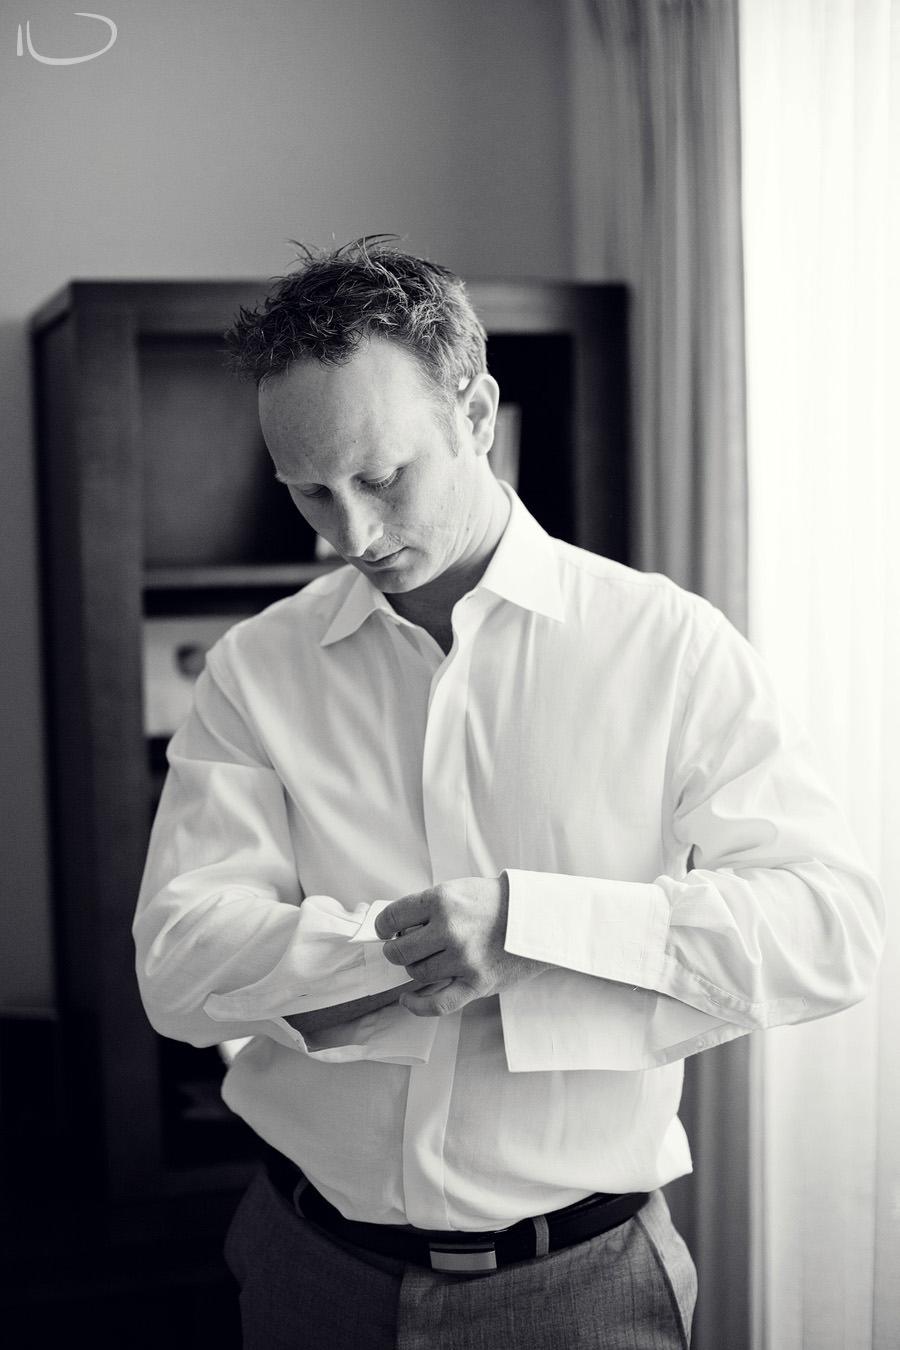 Sutherland Shire Wedding Photographer: Groom putting on cufflinks